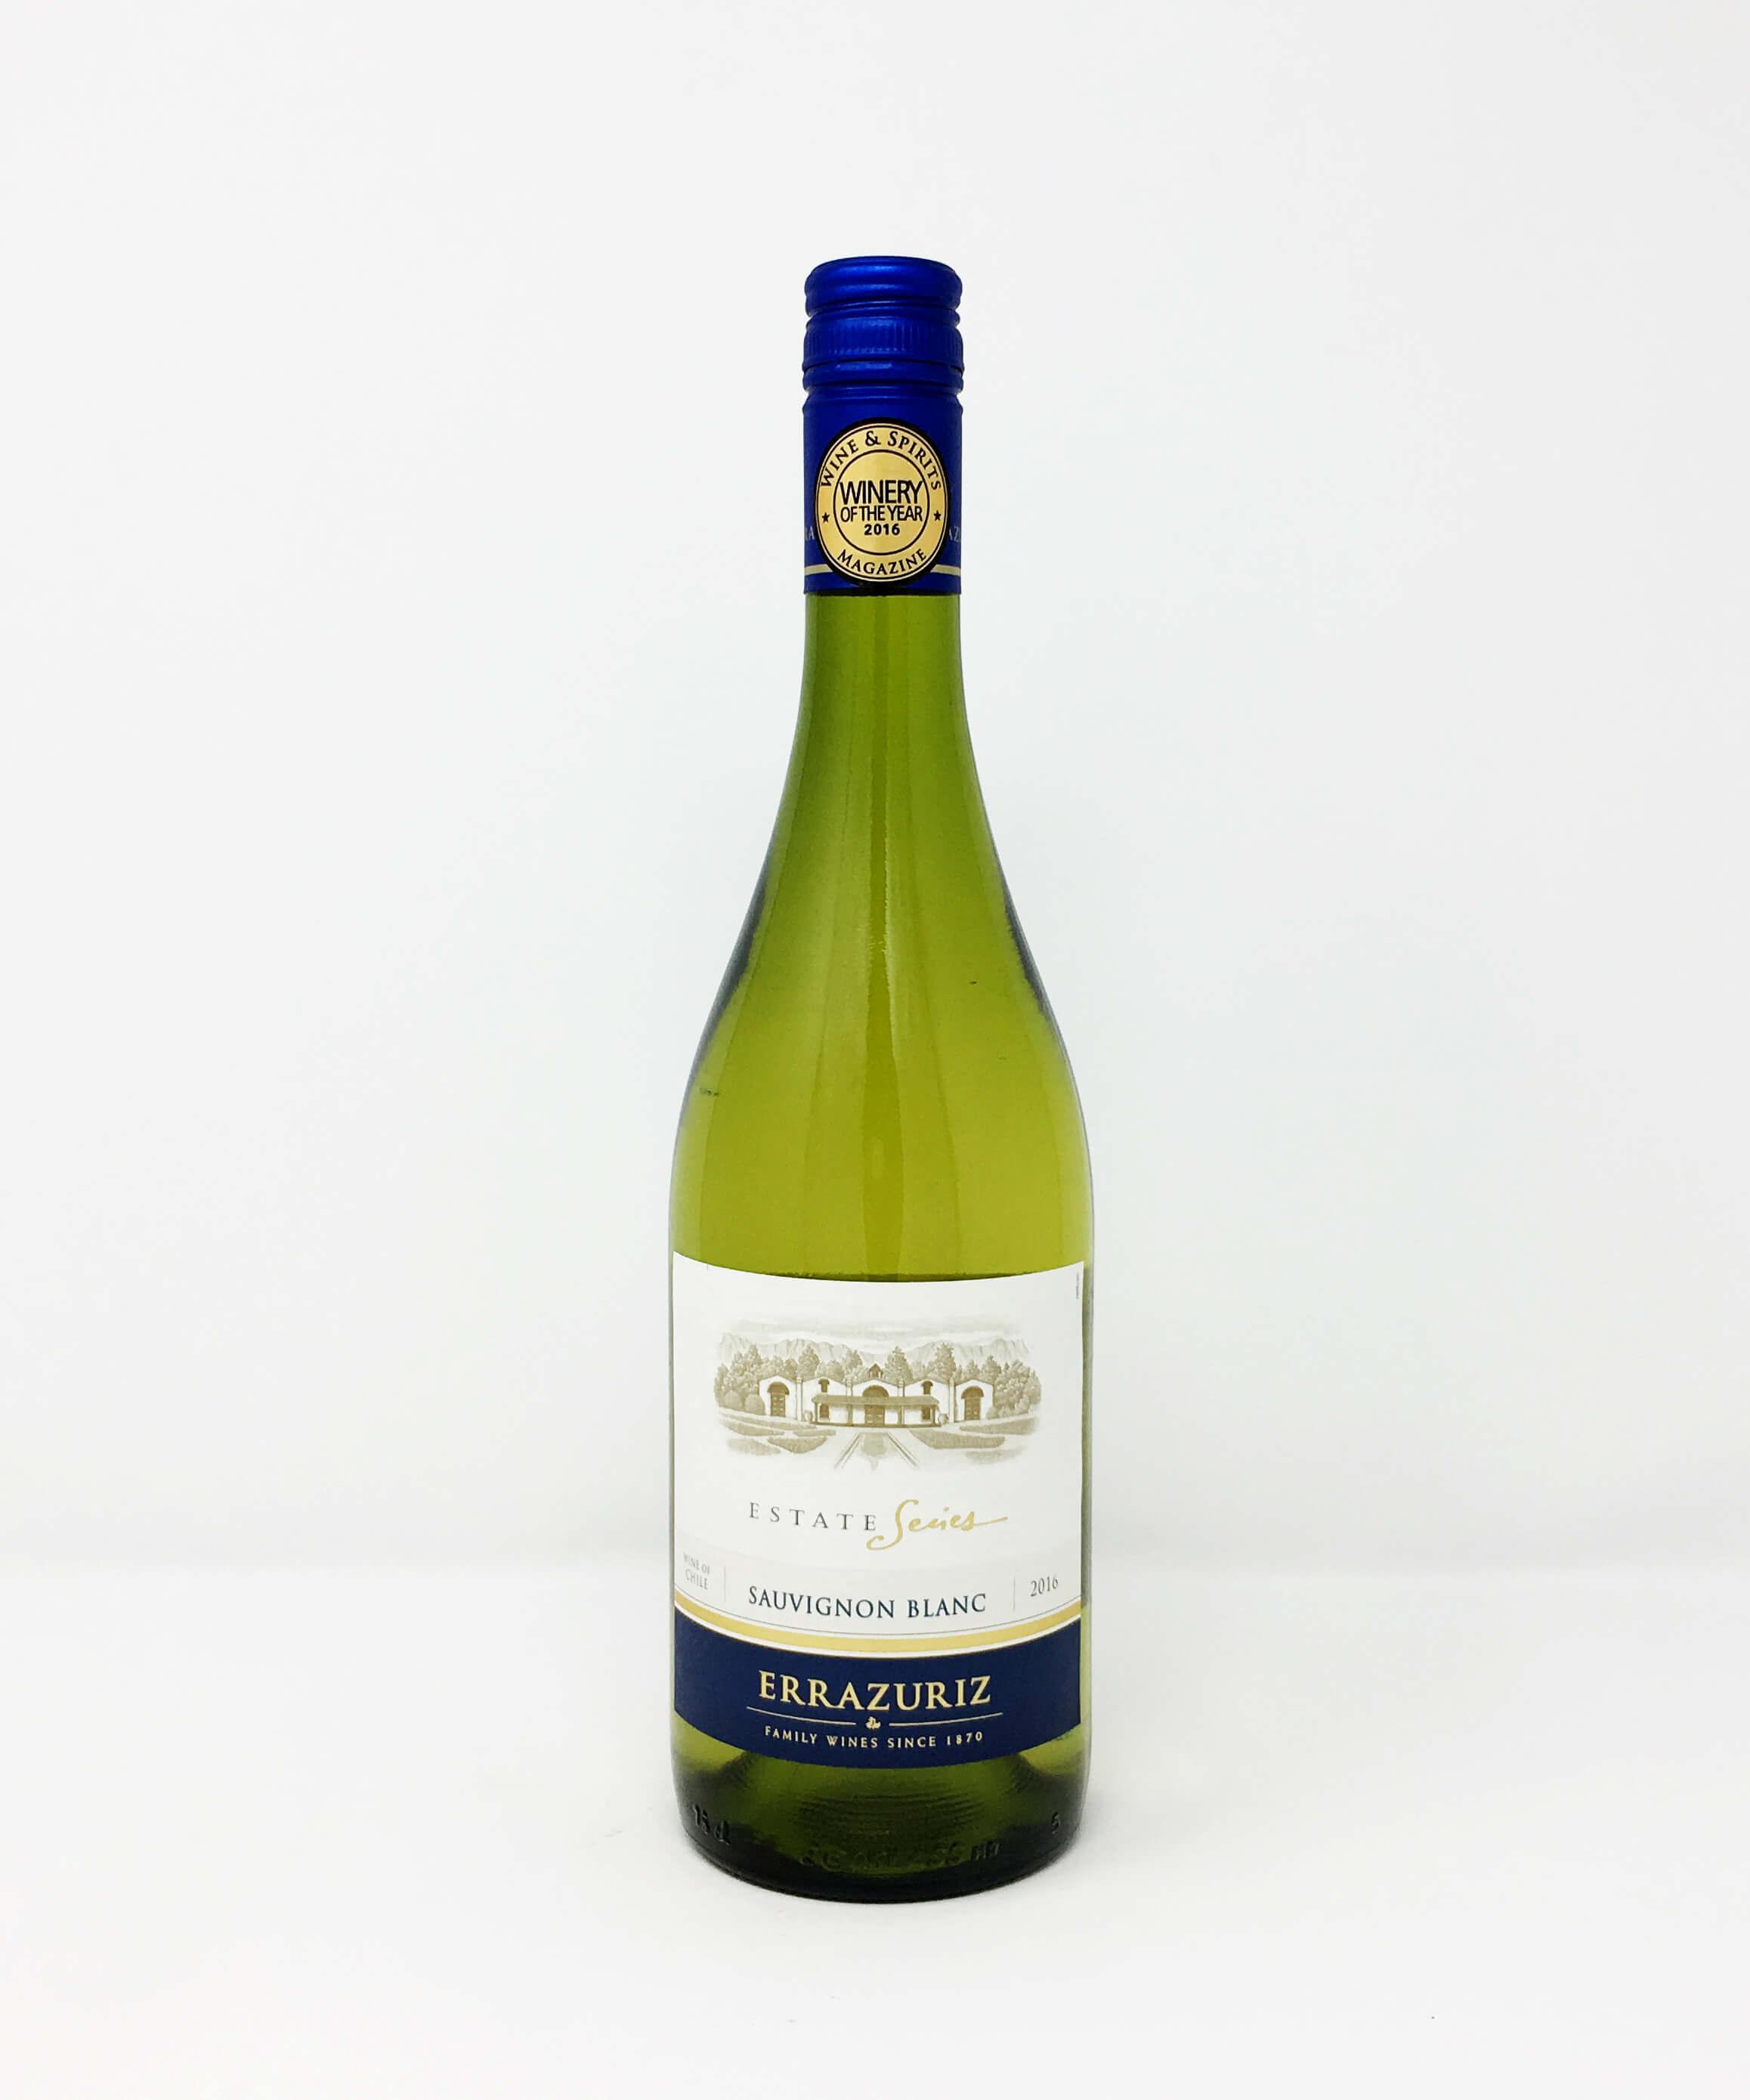 Errazuriz, Estate Series, Sauvignon Blanc